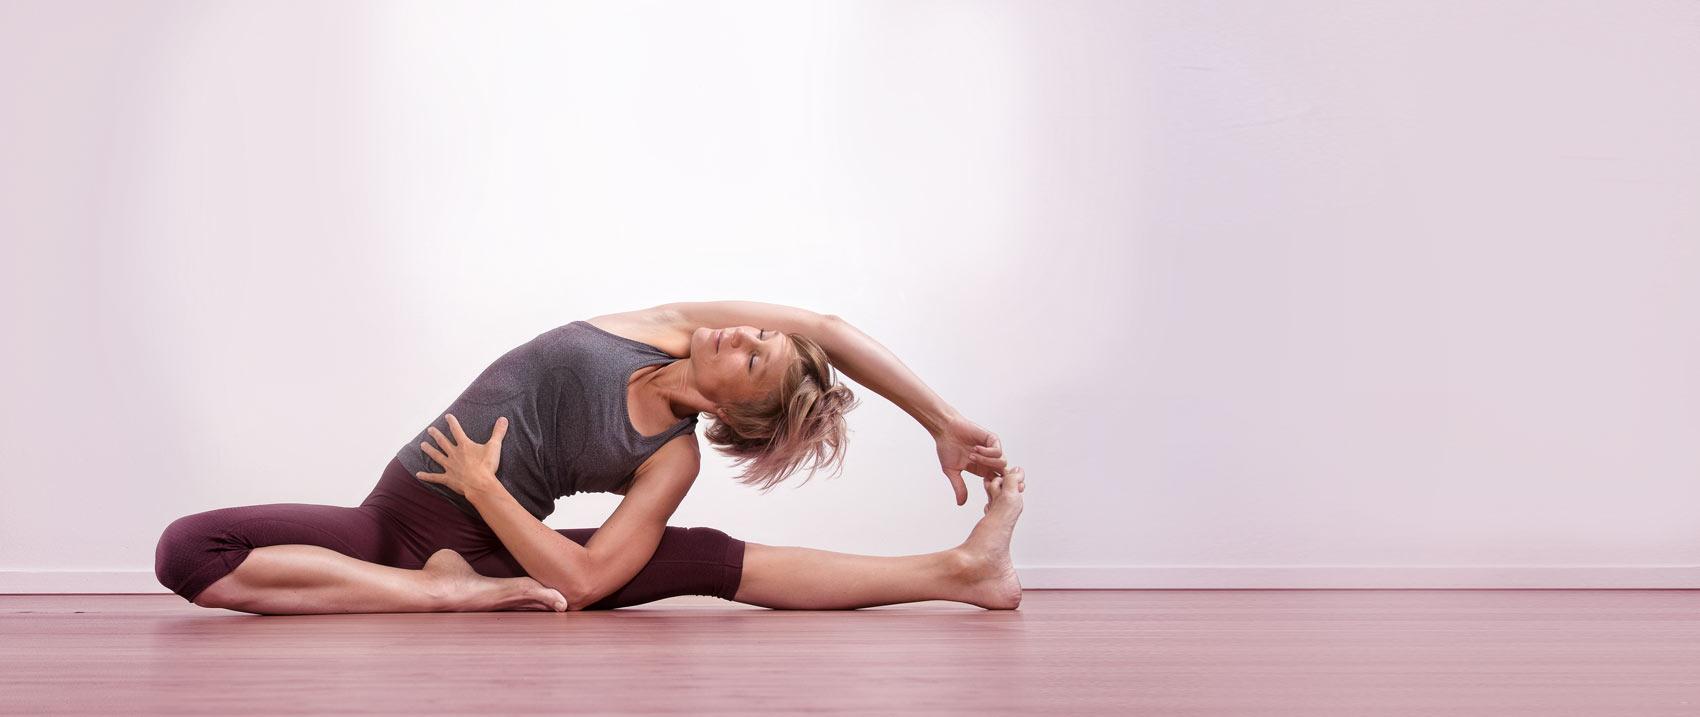 Yin yoga, Yang Yoga, Jose de groot